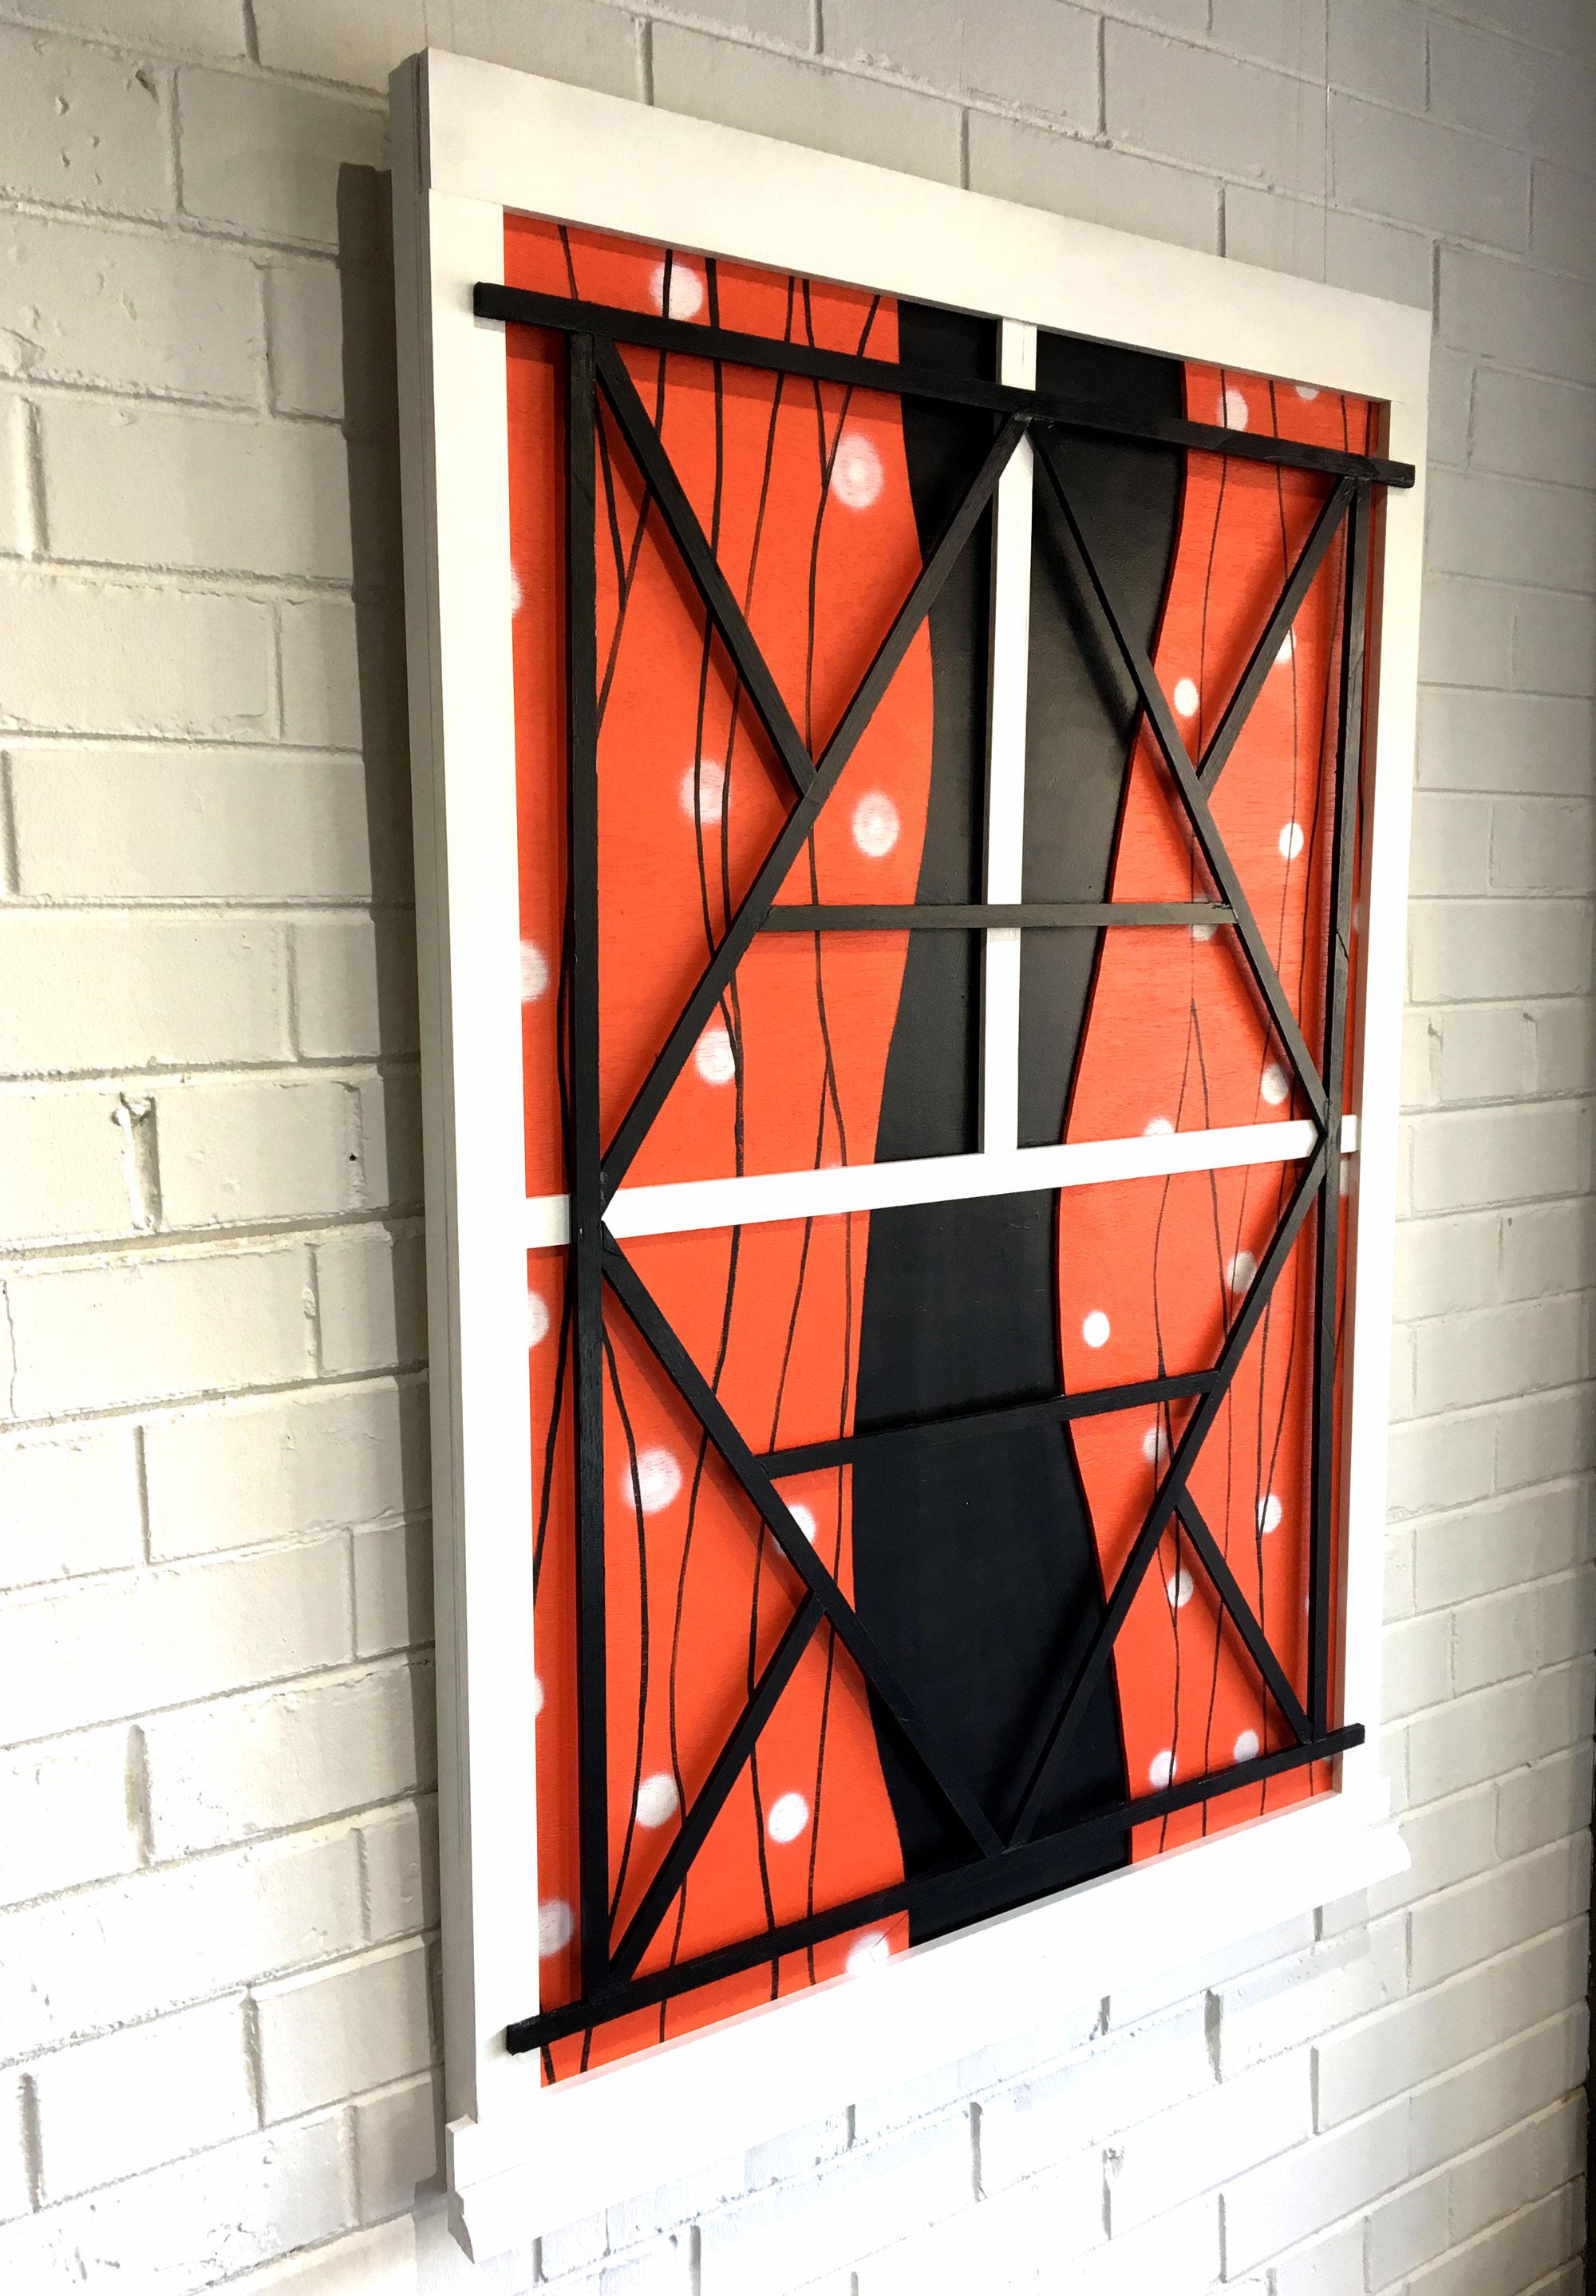 tom-gerrard-window-4.JPG